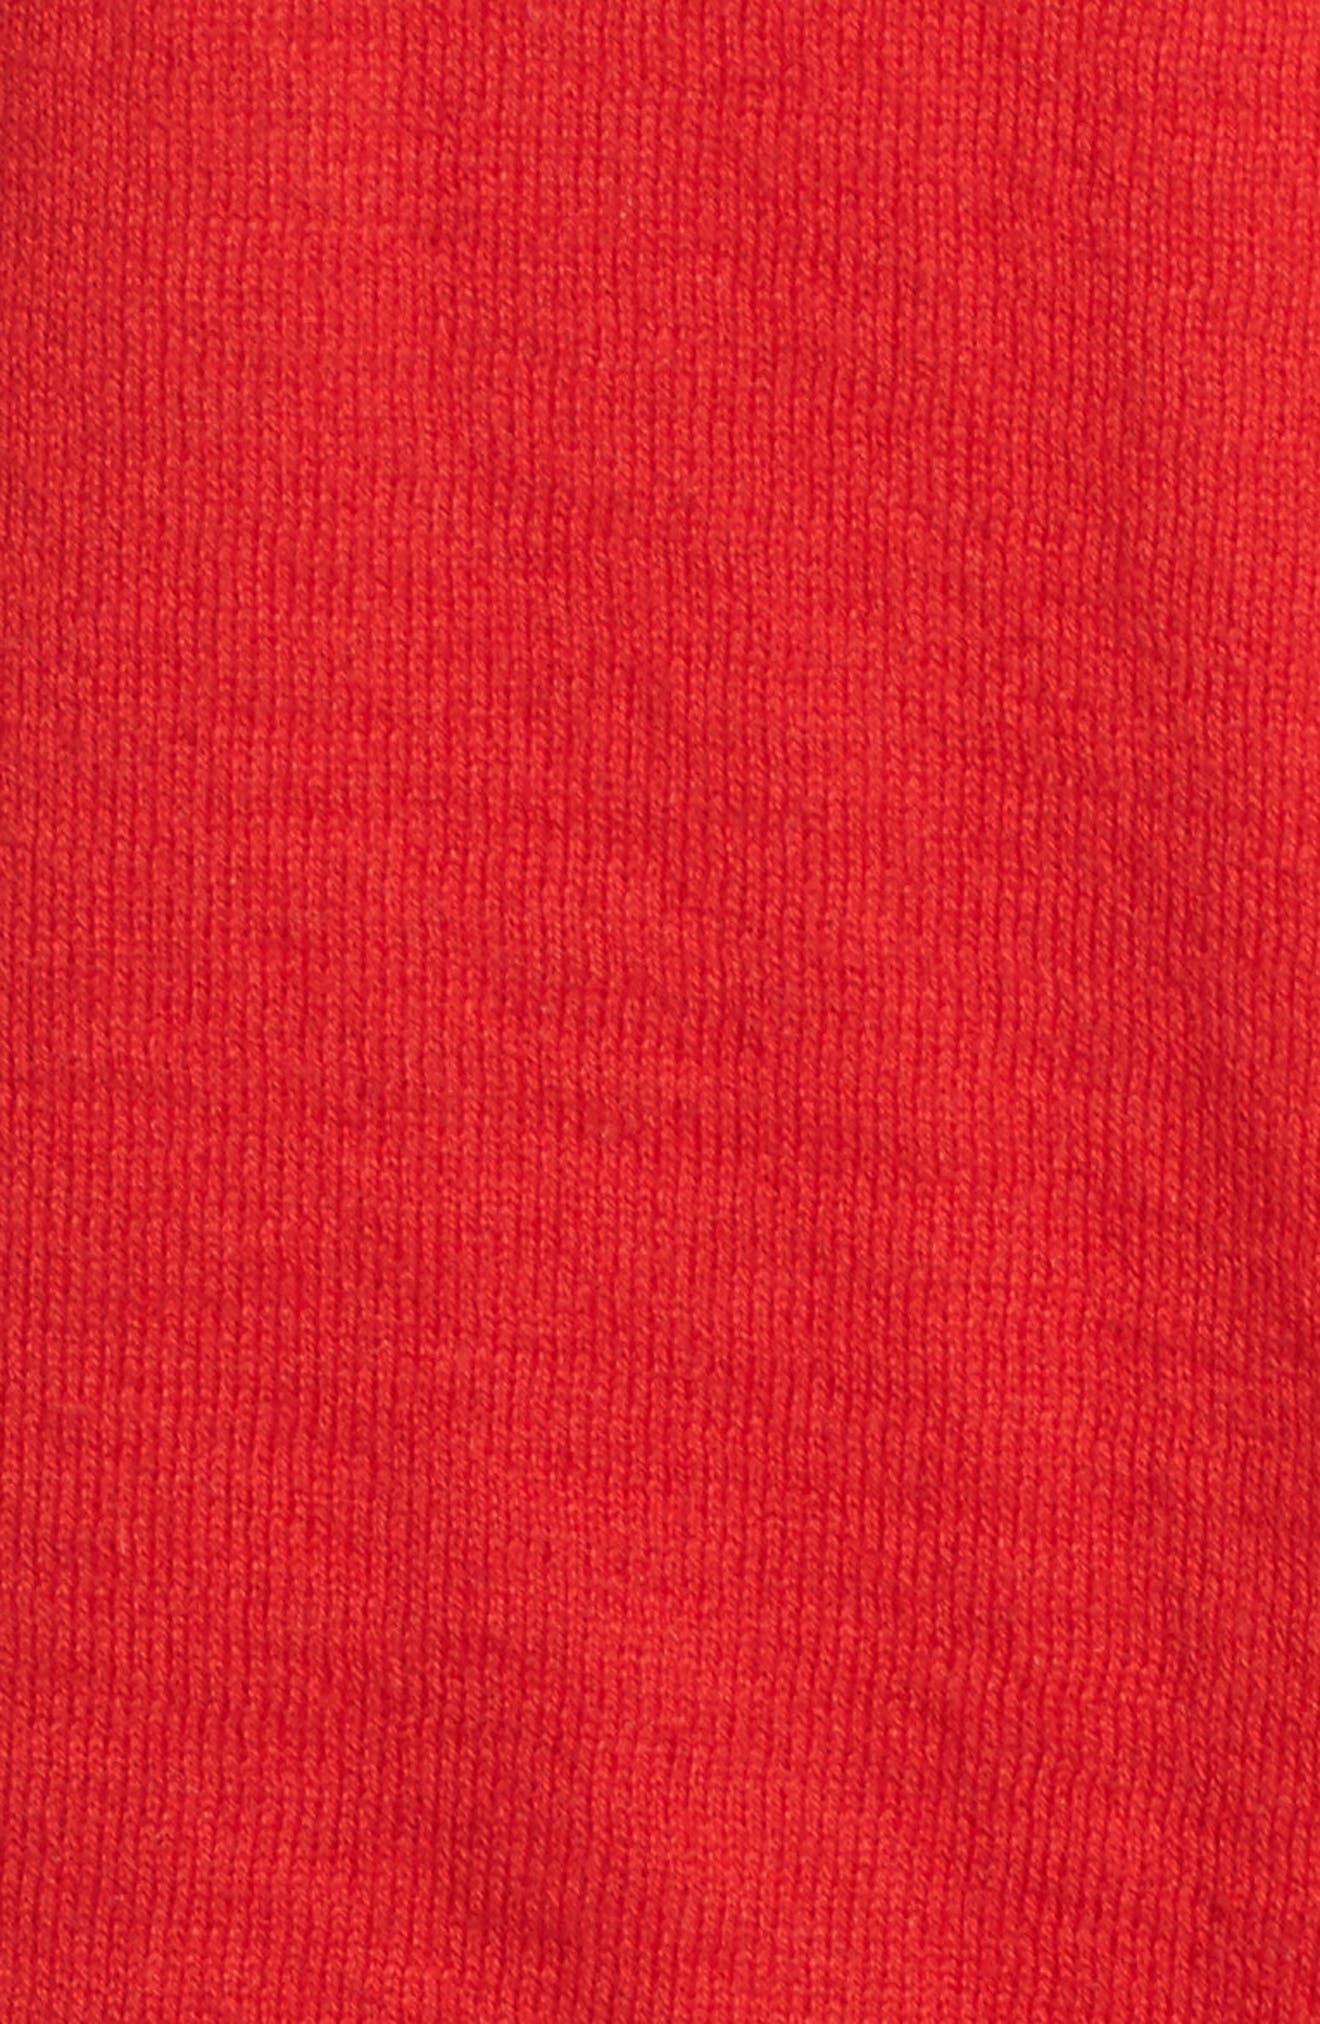 Weekends Intarsia Sweater,                             Alternate thumbnail 6, color,                             Cardinal